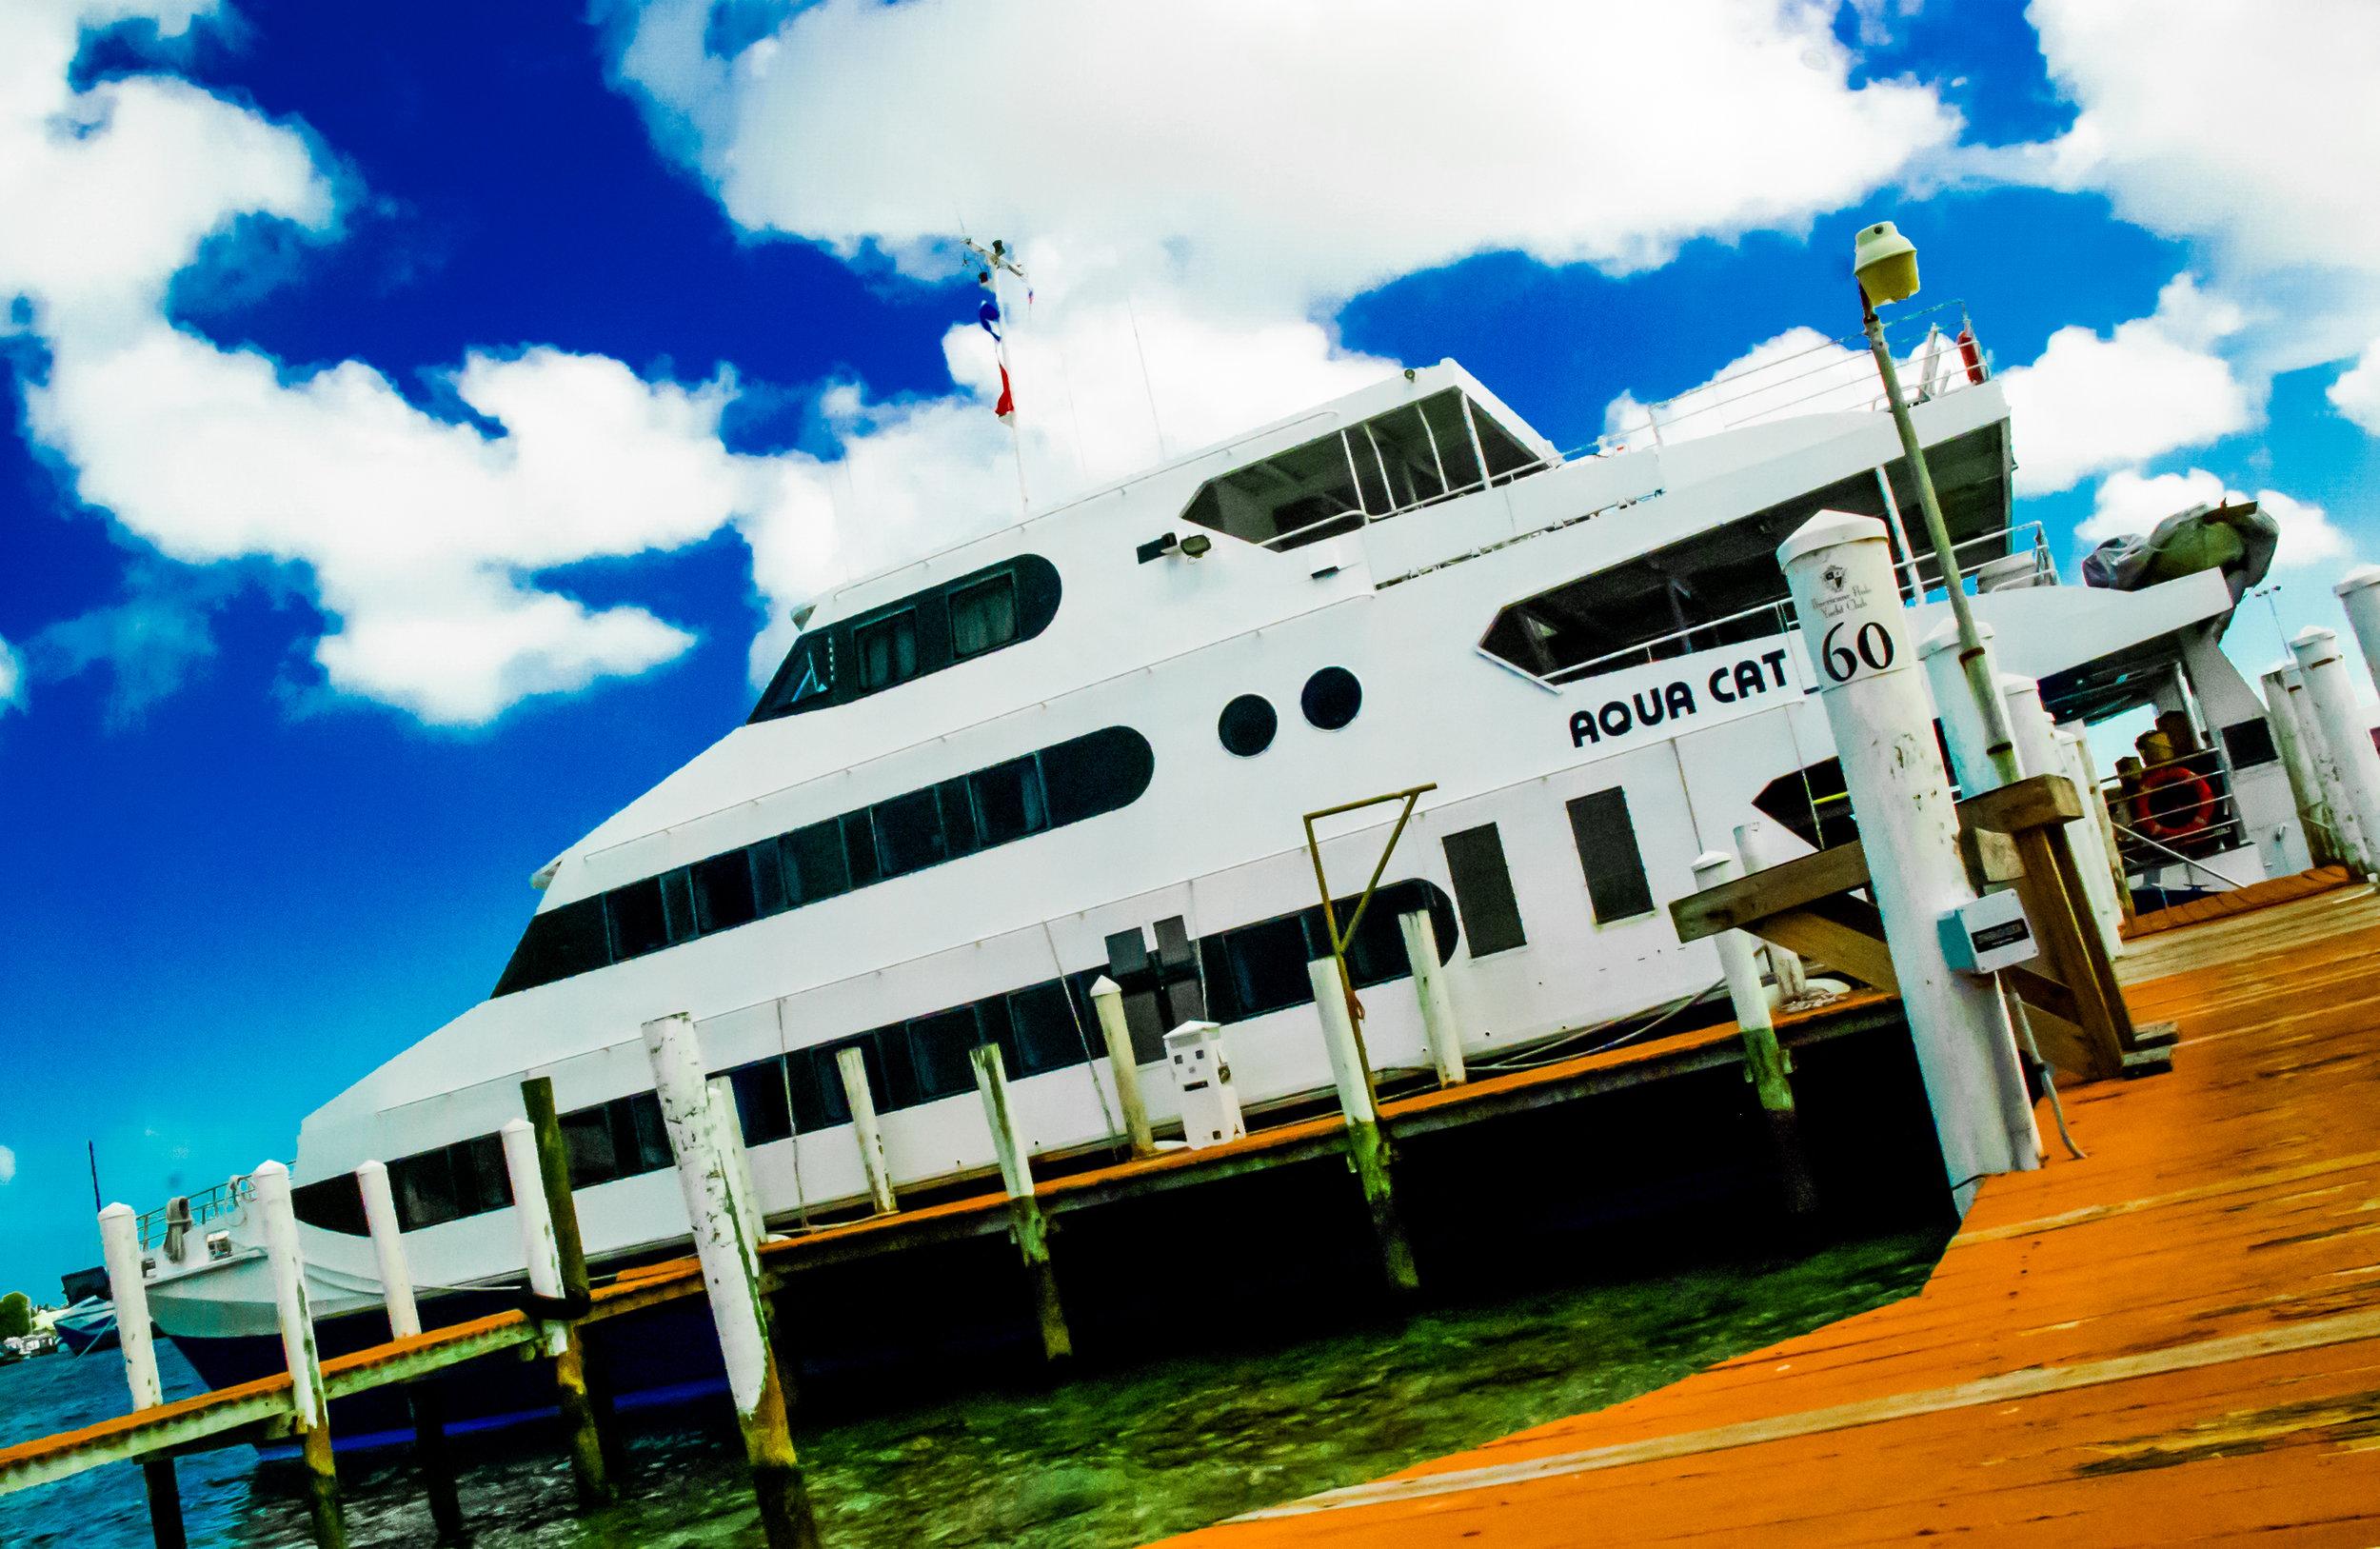 Bahamas LiveAboard CME — Wild Med Adventures